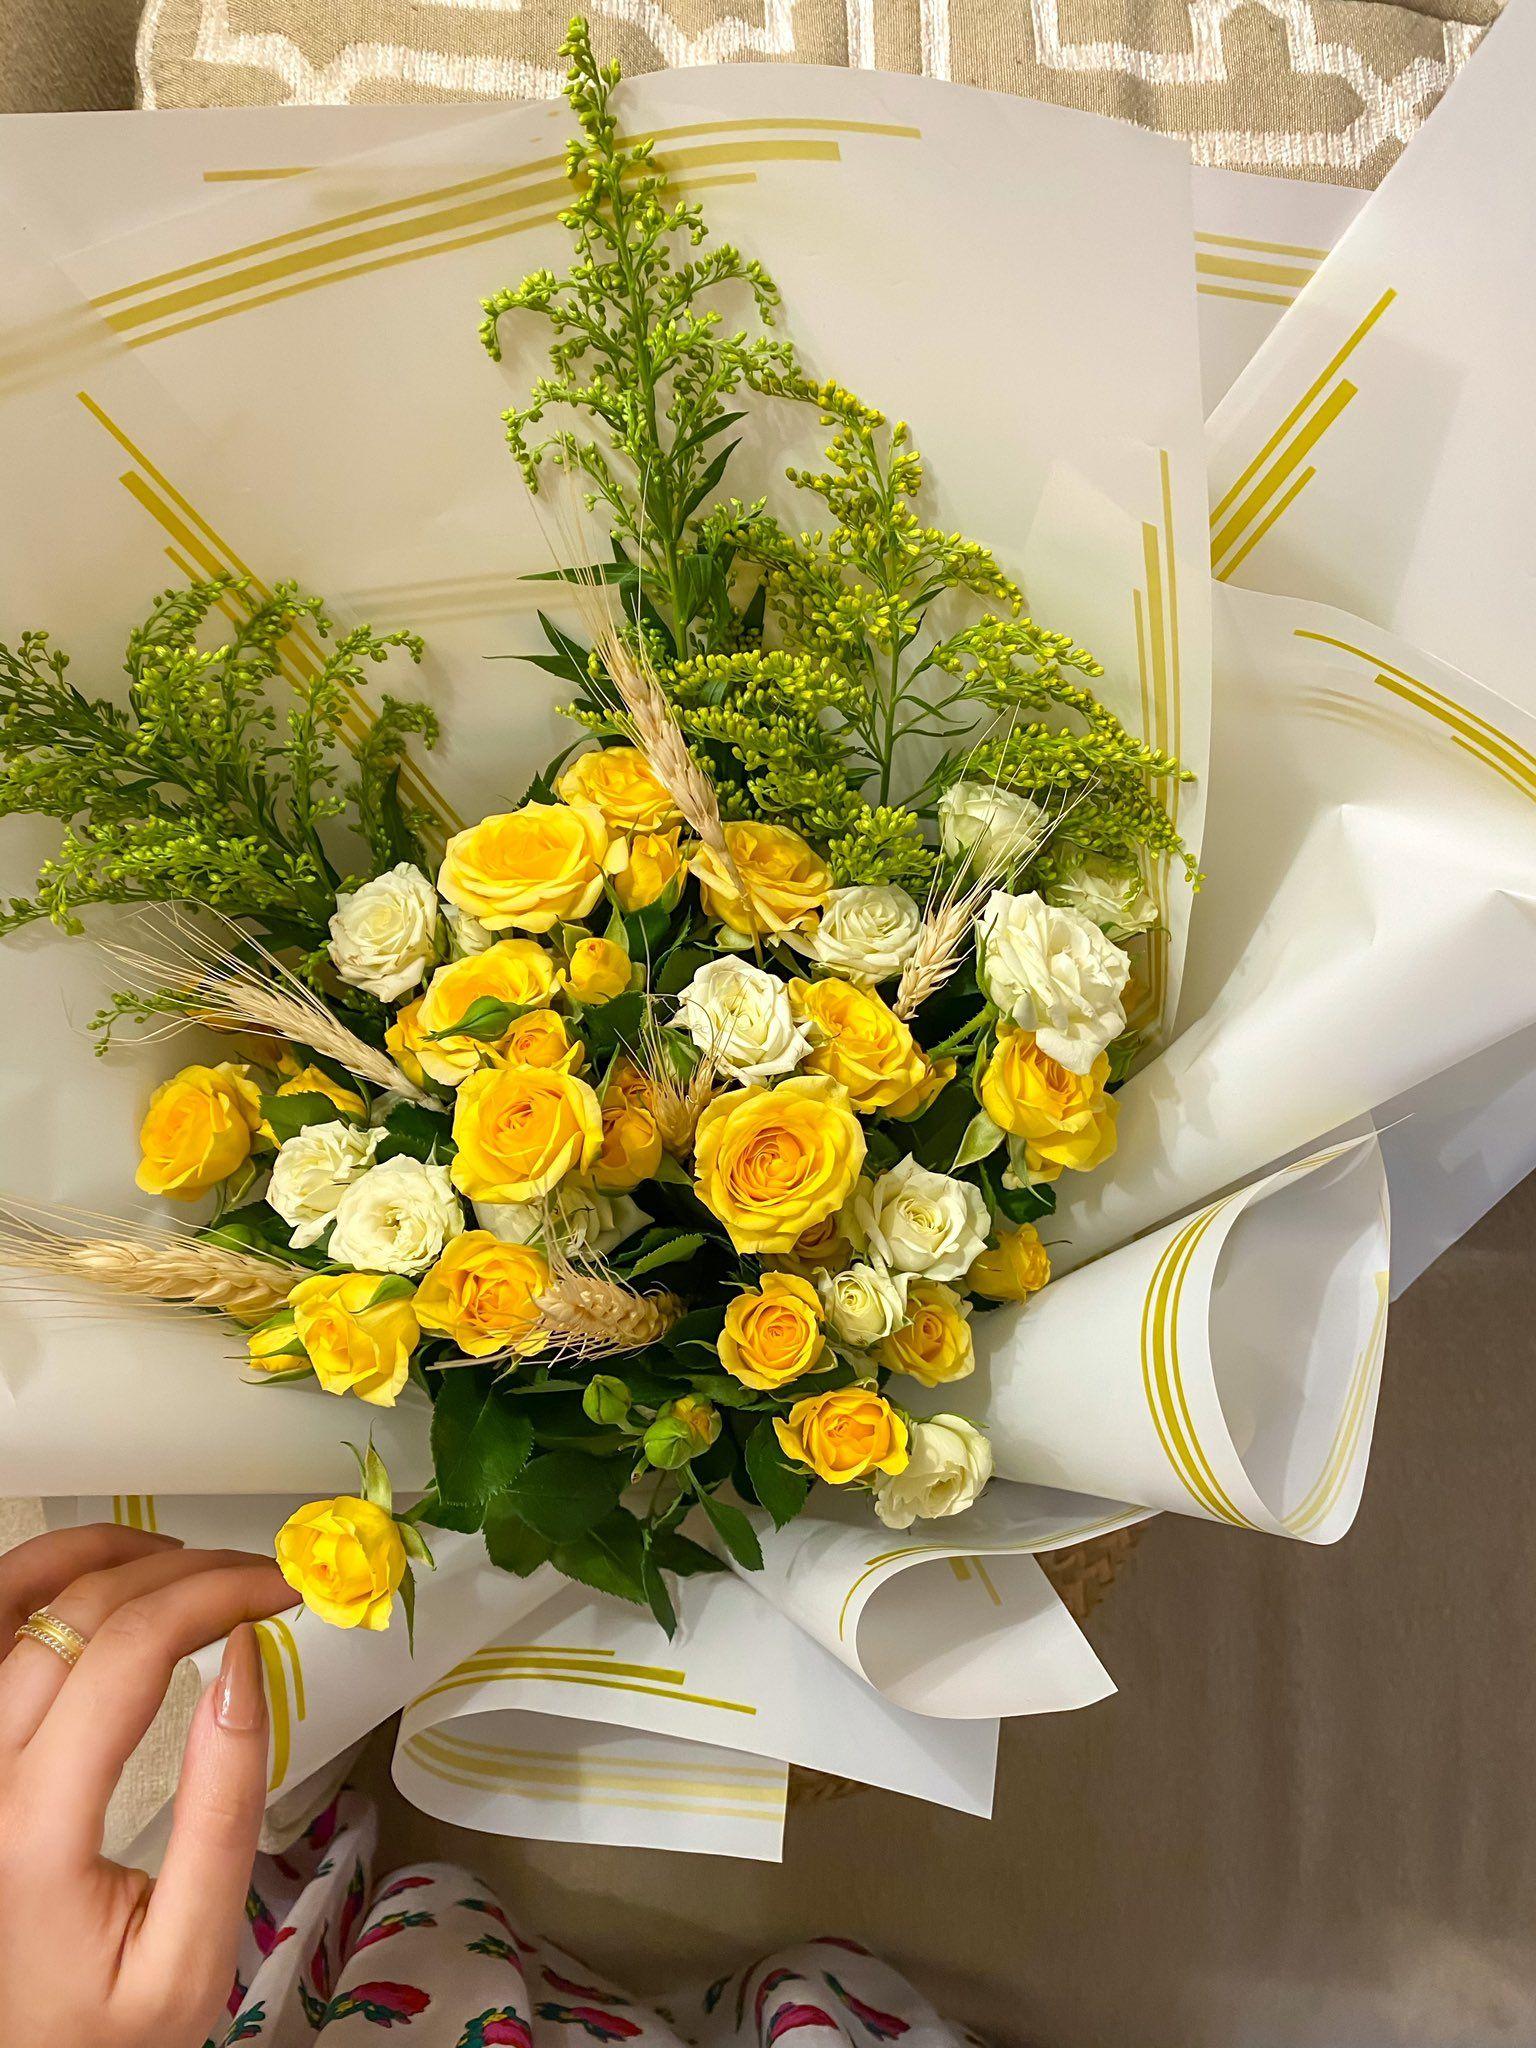 𝙳𝚛 𝚆𝚎𝚏 On Twitter Flower Background Wallpaper Flower Aesthetic Beautiful Flowers